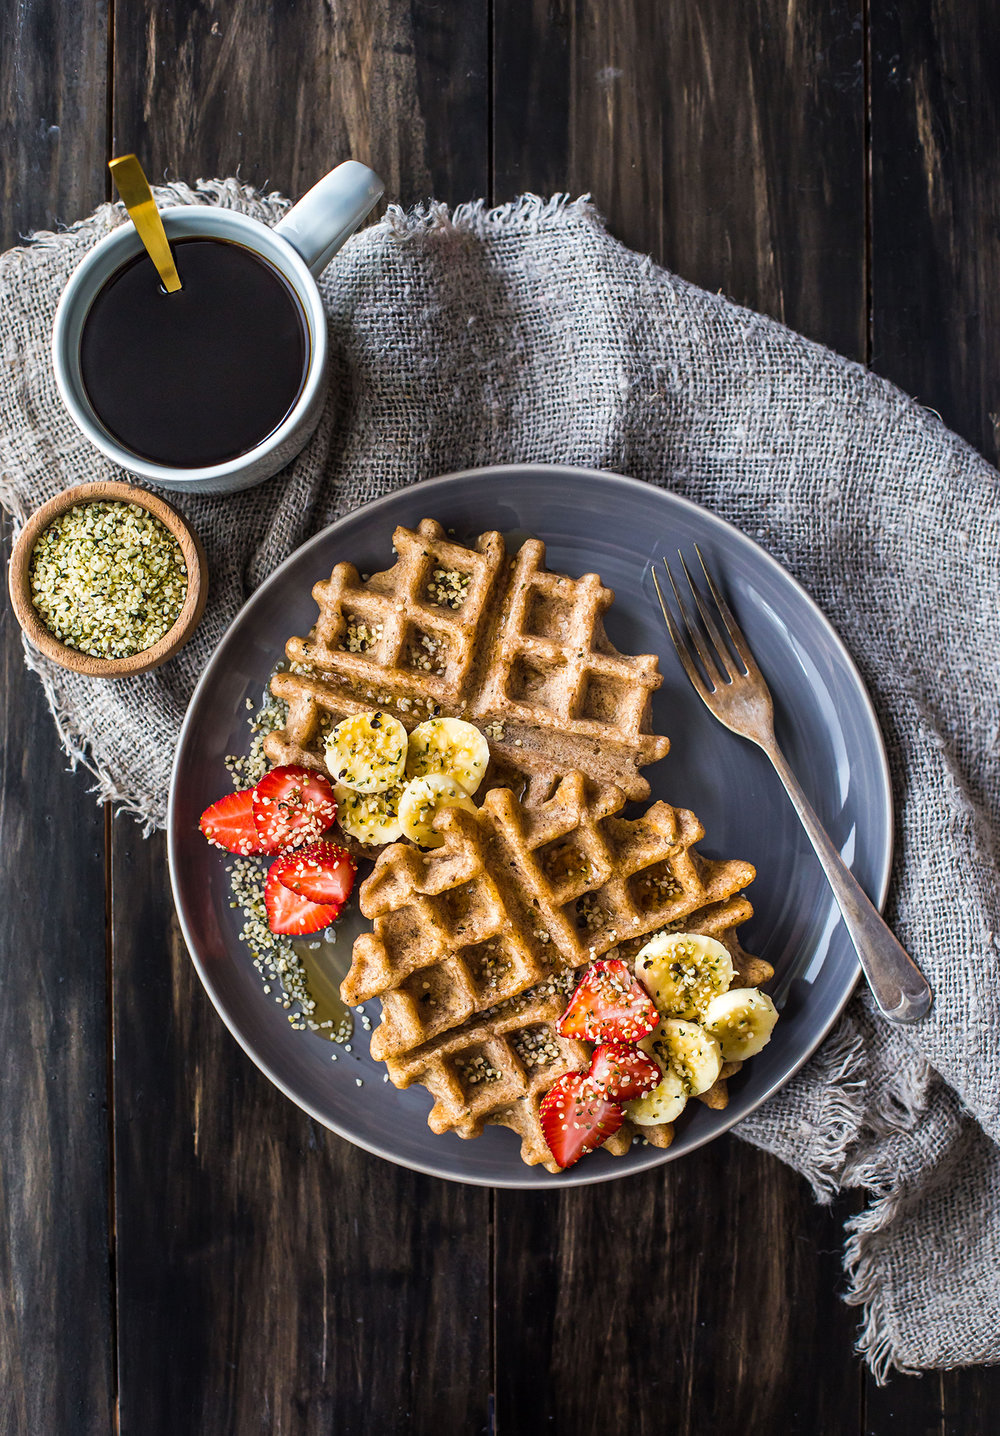 waffles resized.jpg